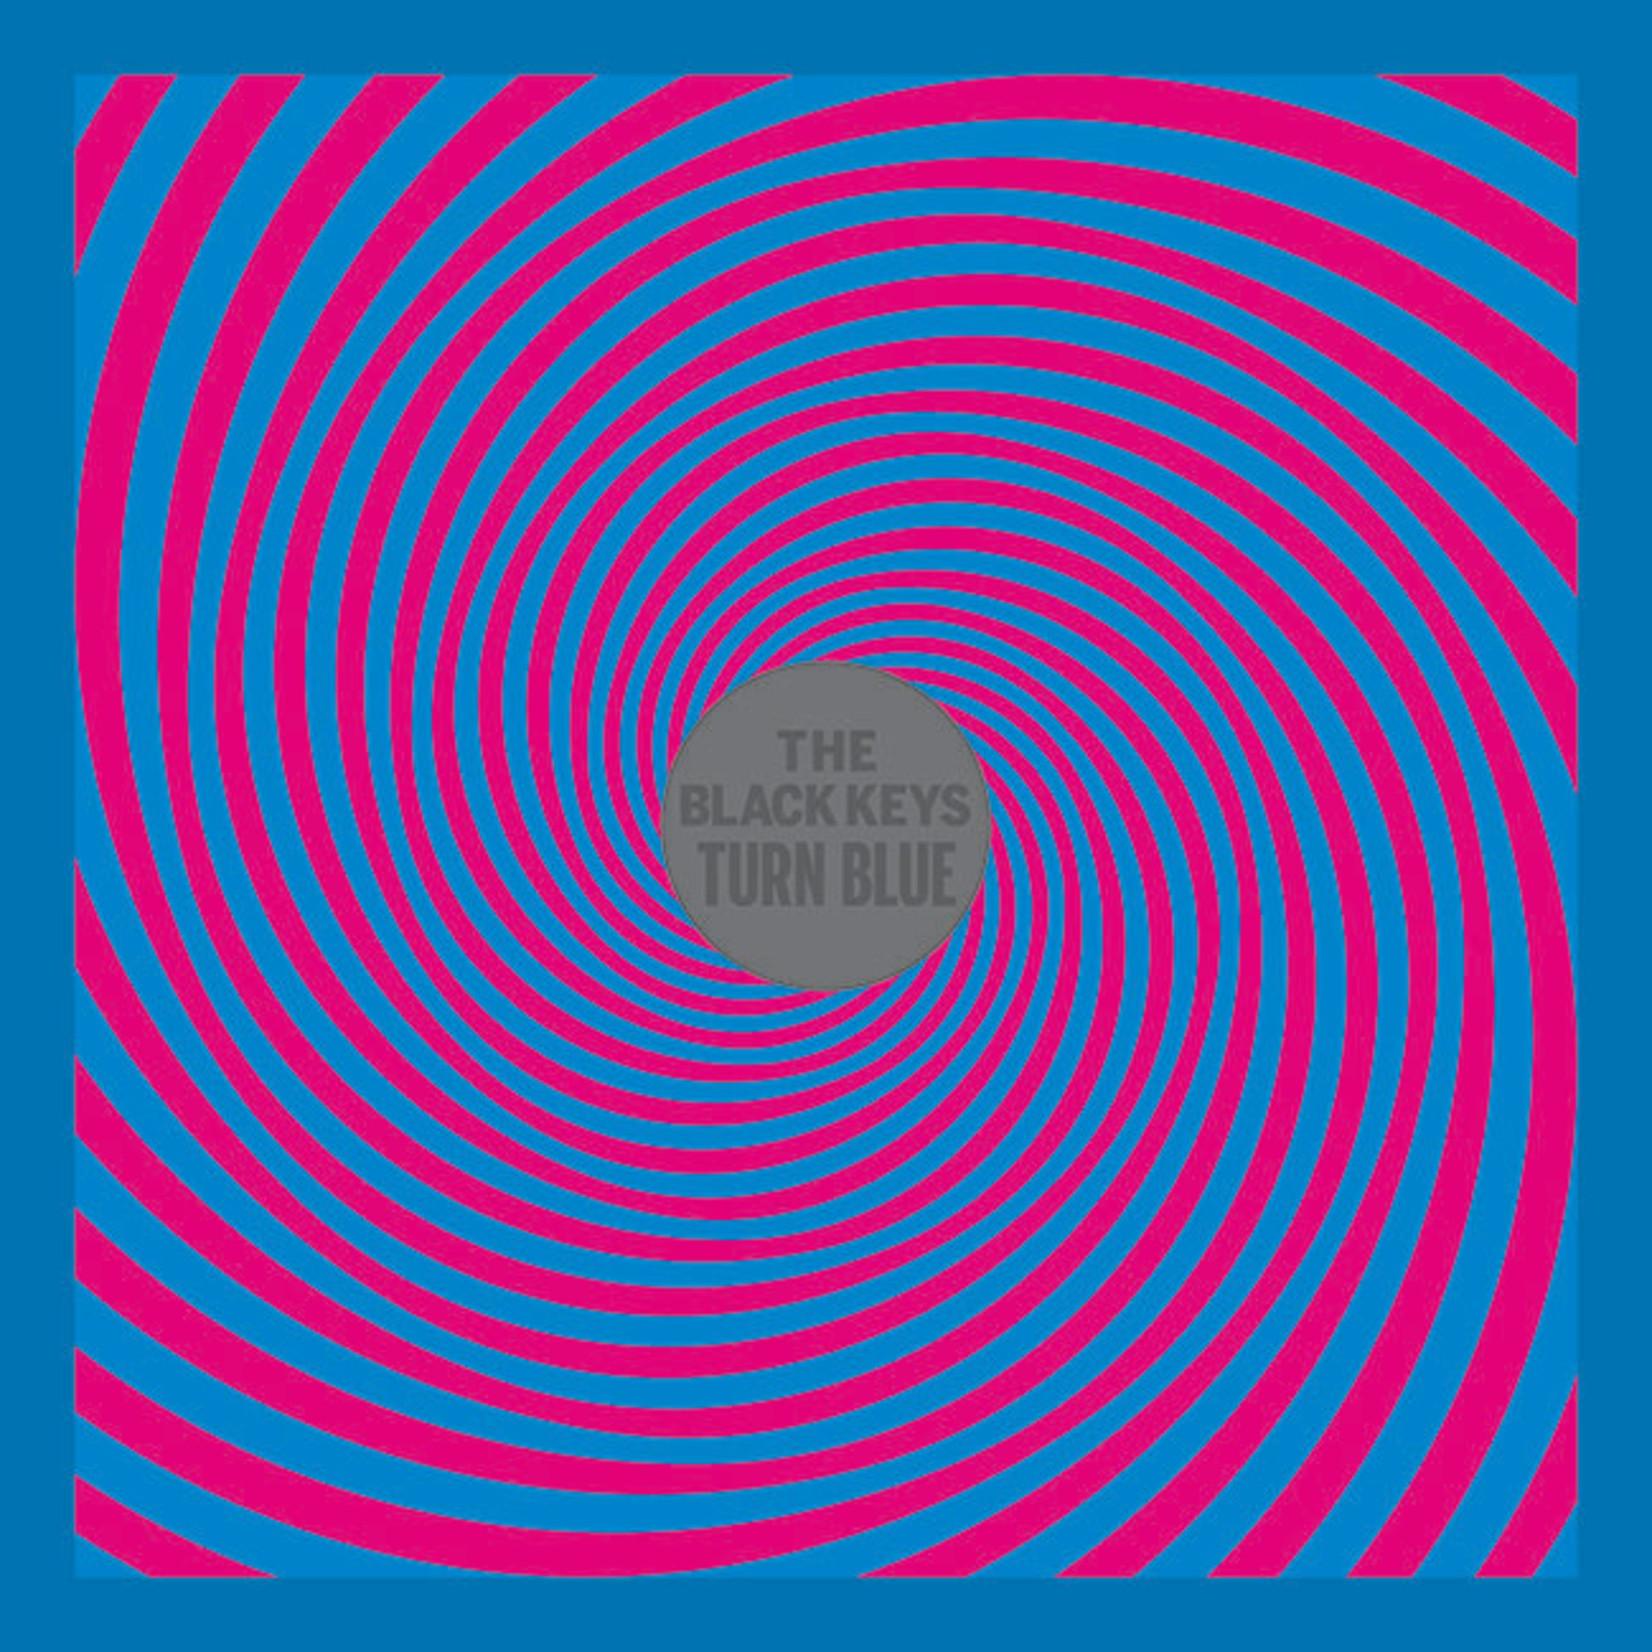 [New] Black Keys: Turn Blue